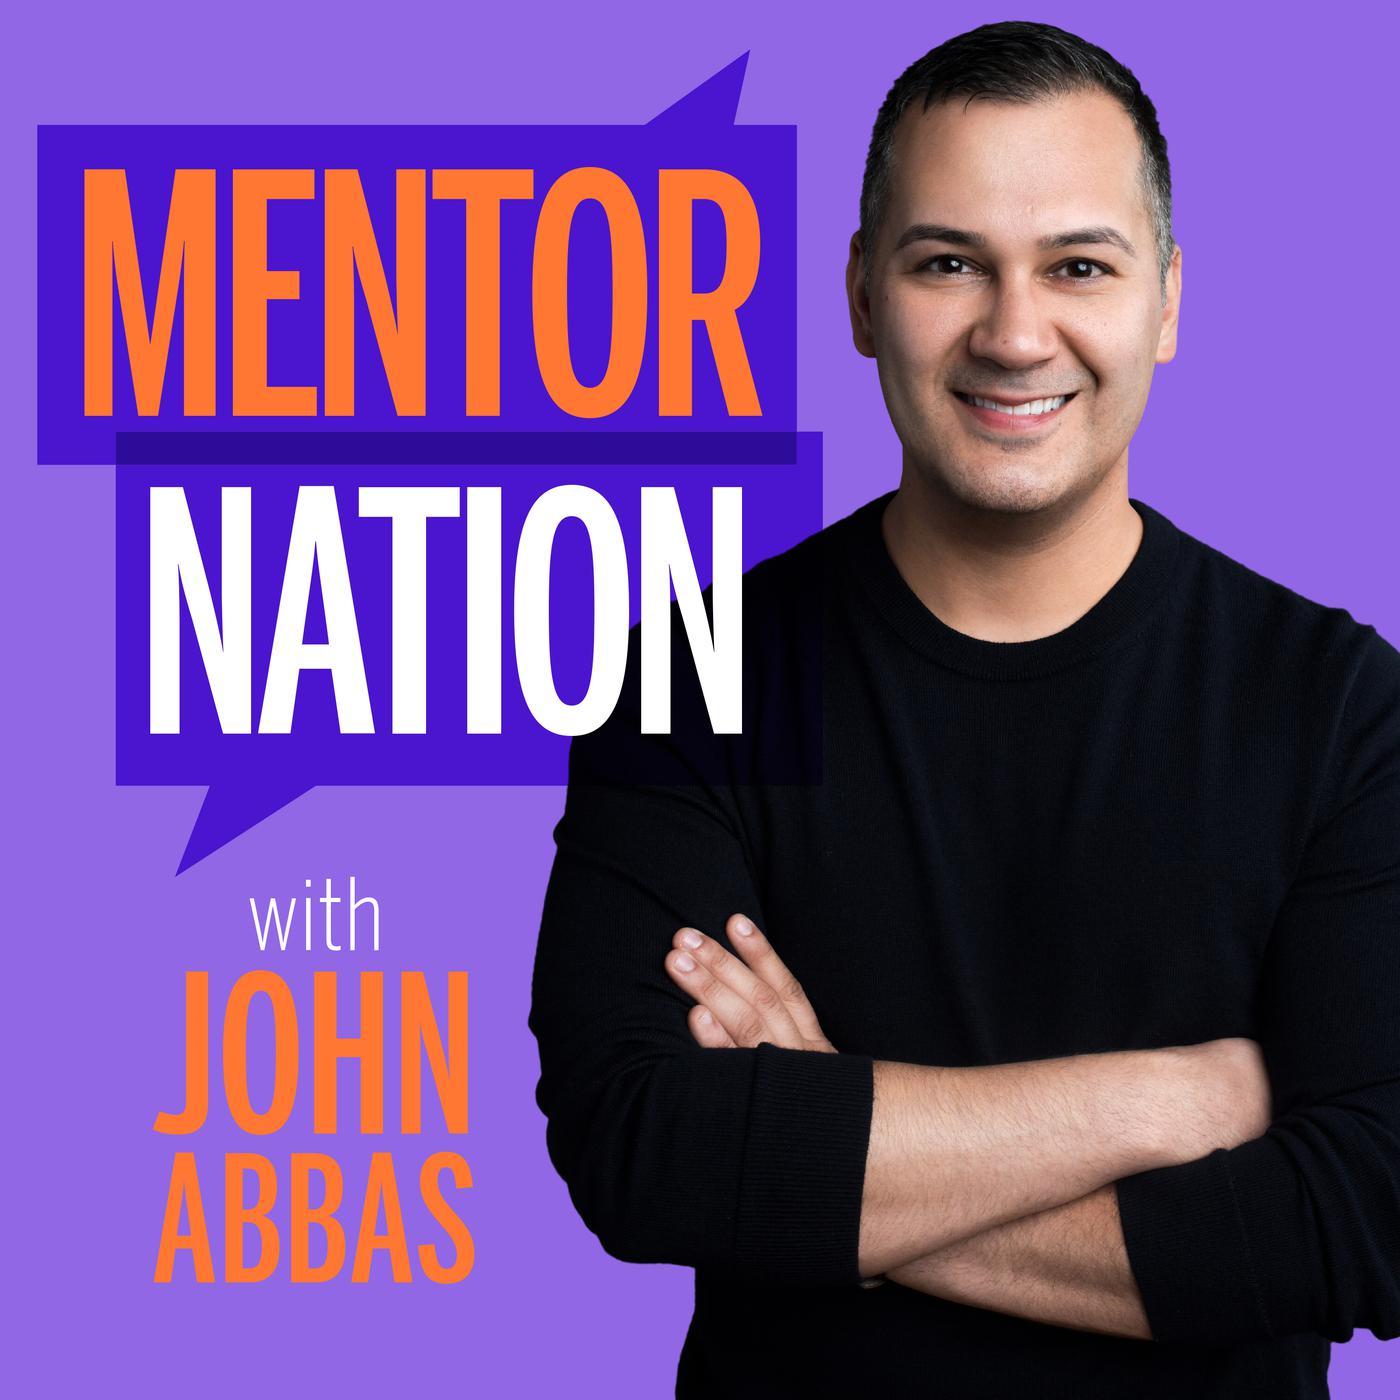 mentor-nation-with-john-abbas-john-abbas-VHS8Zt-_J2P-GT8N3vmSAxO.1400x1400